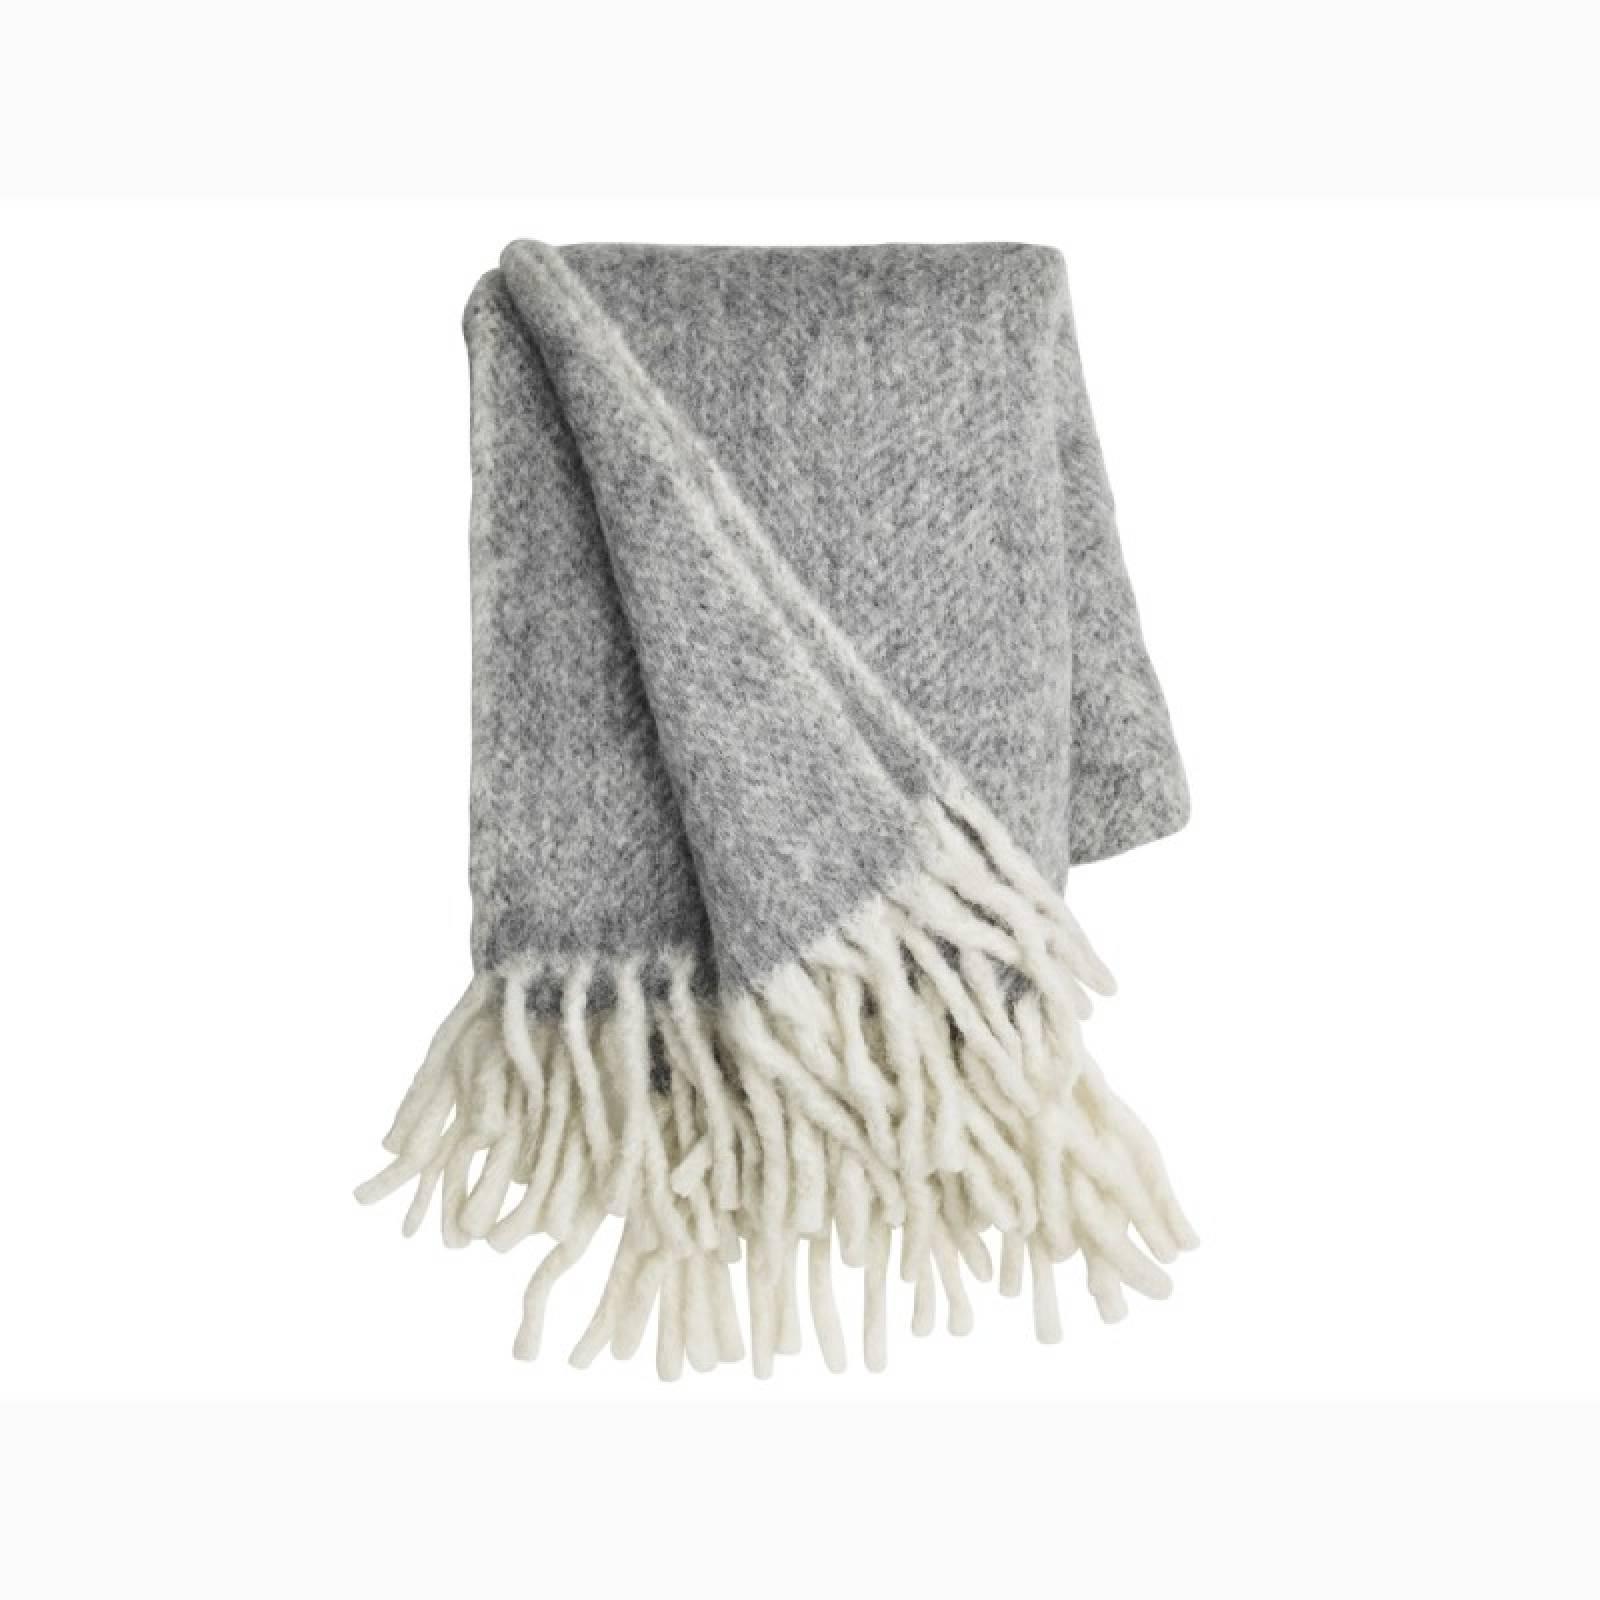 Large Mathea Blanket Throw In Grey